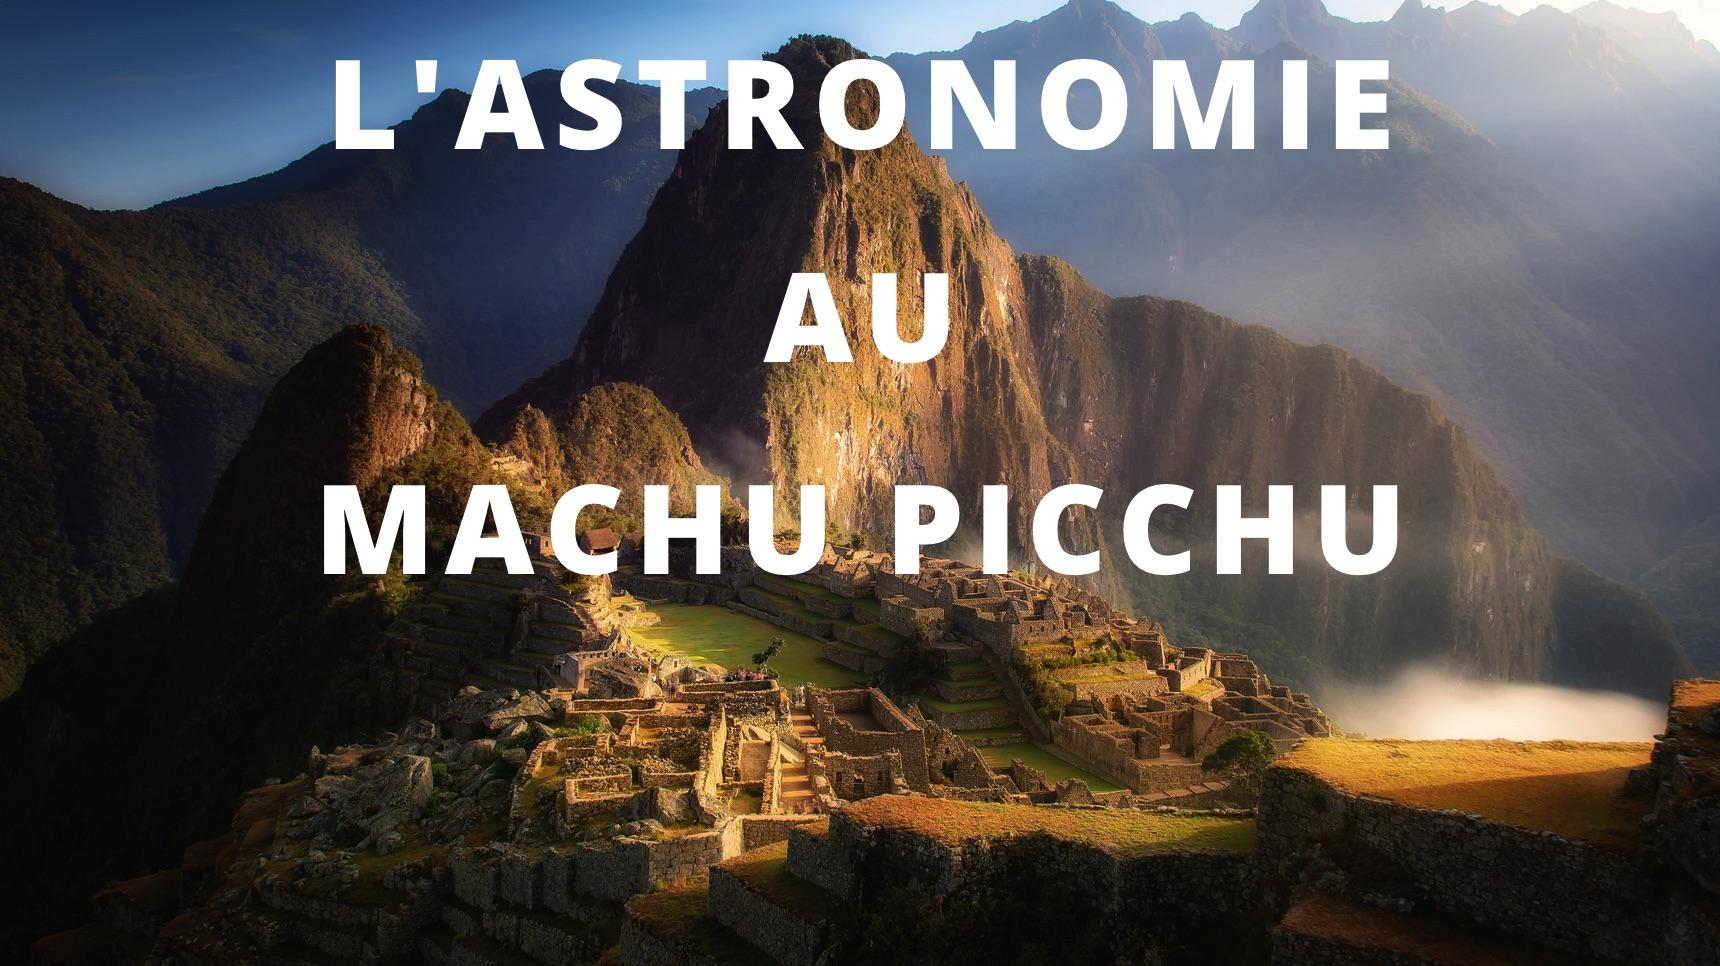 extrait-artecc81-france-5-machu-picchu_scruberthumbnail_1